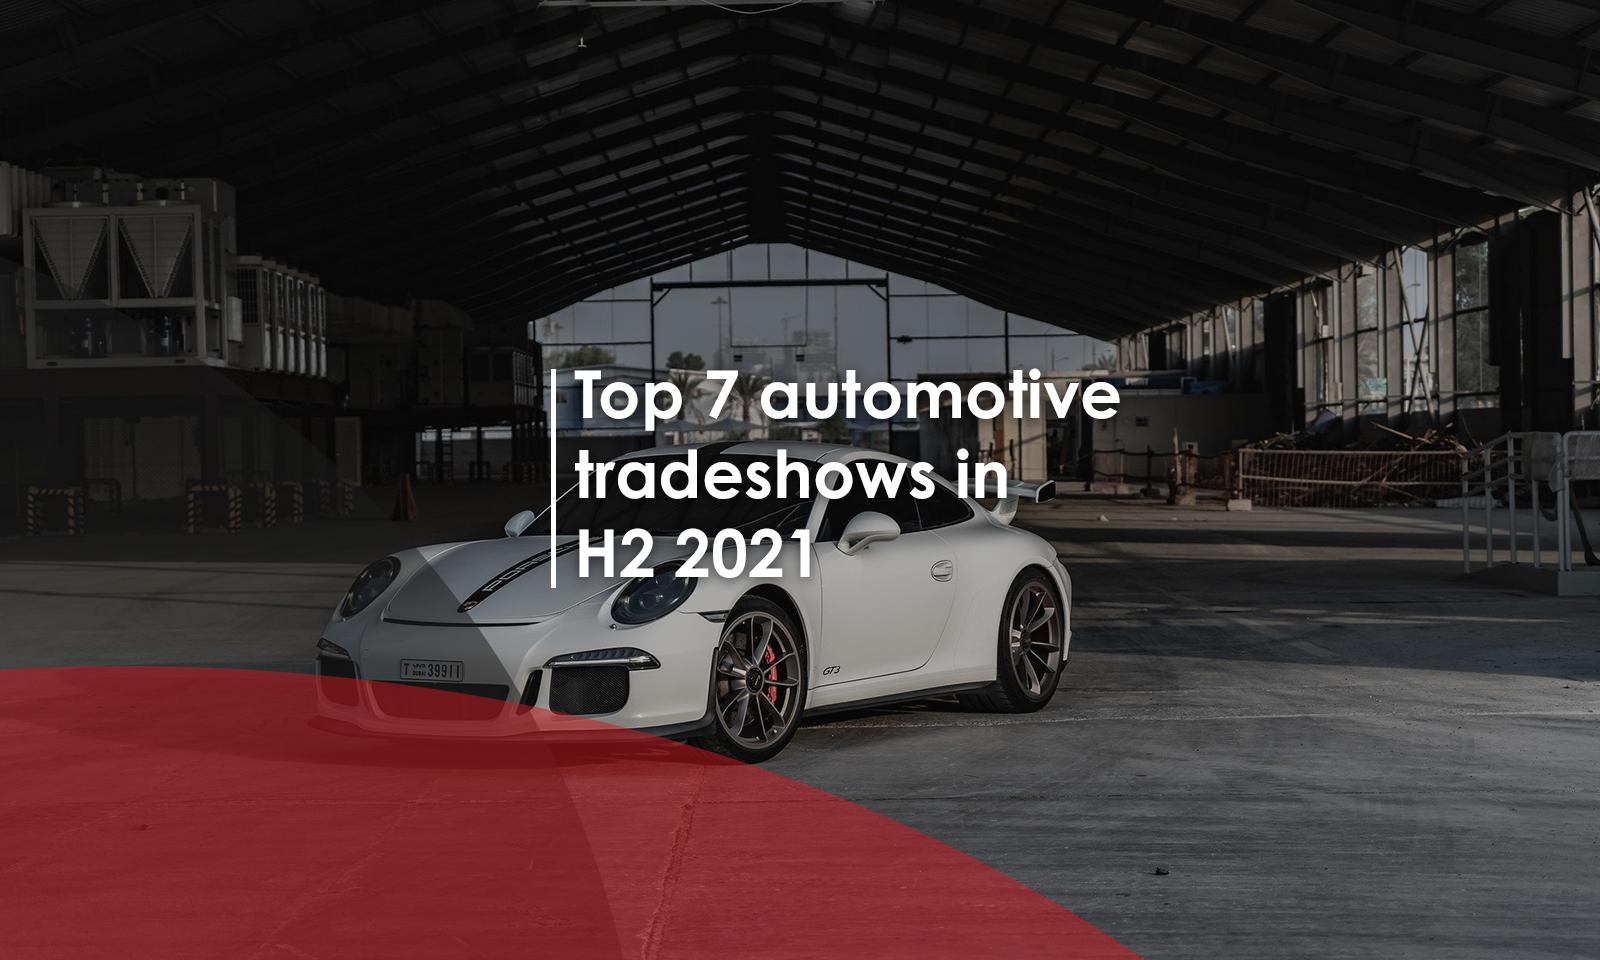 Top 6 automotive tradeshows in H2 2021